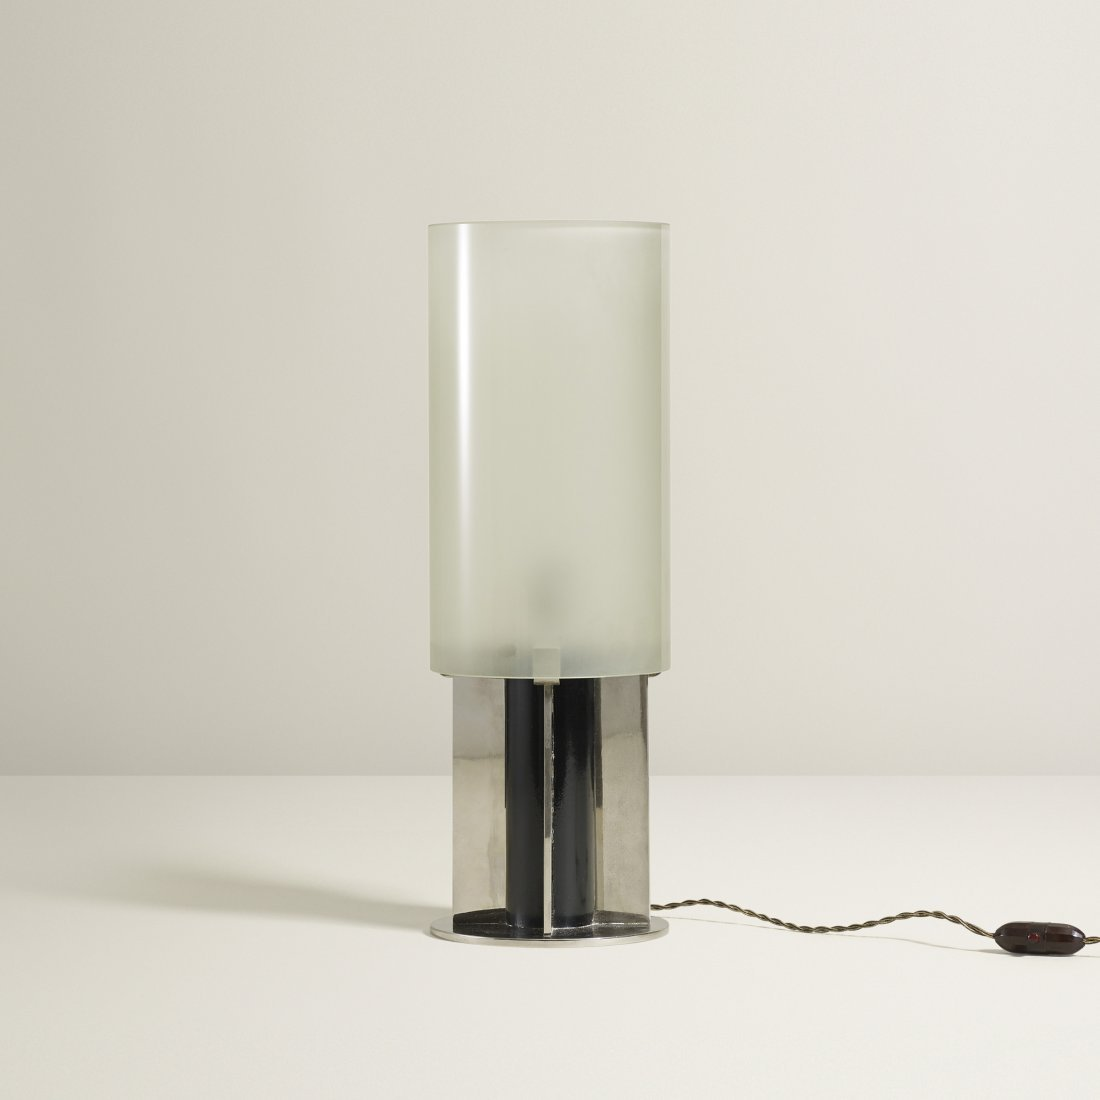 Boris Lacroix table lamp